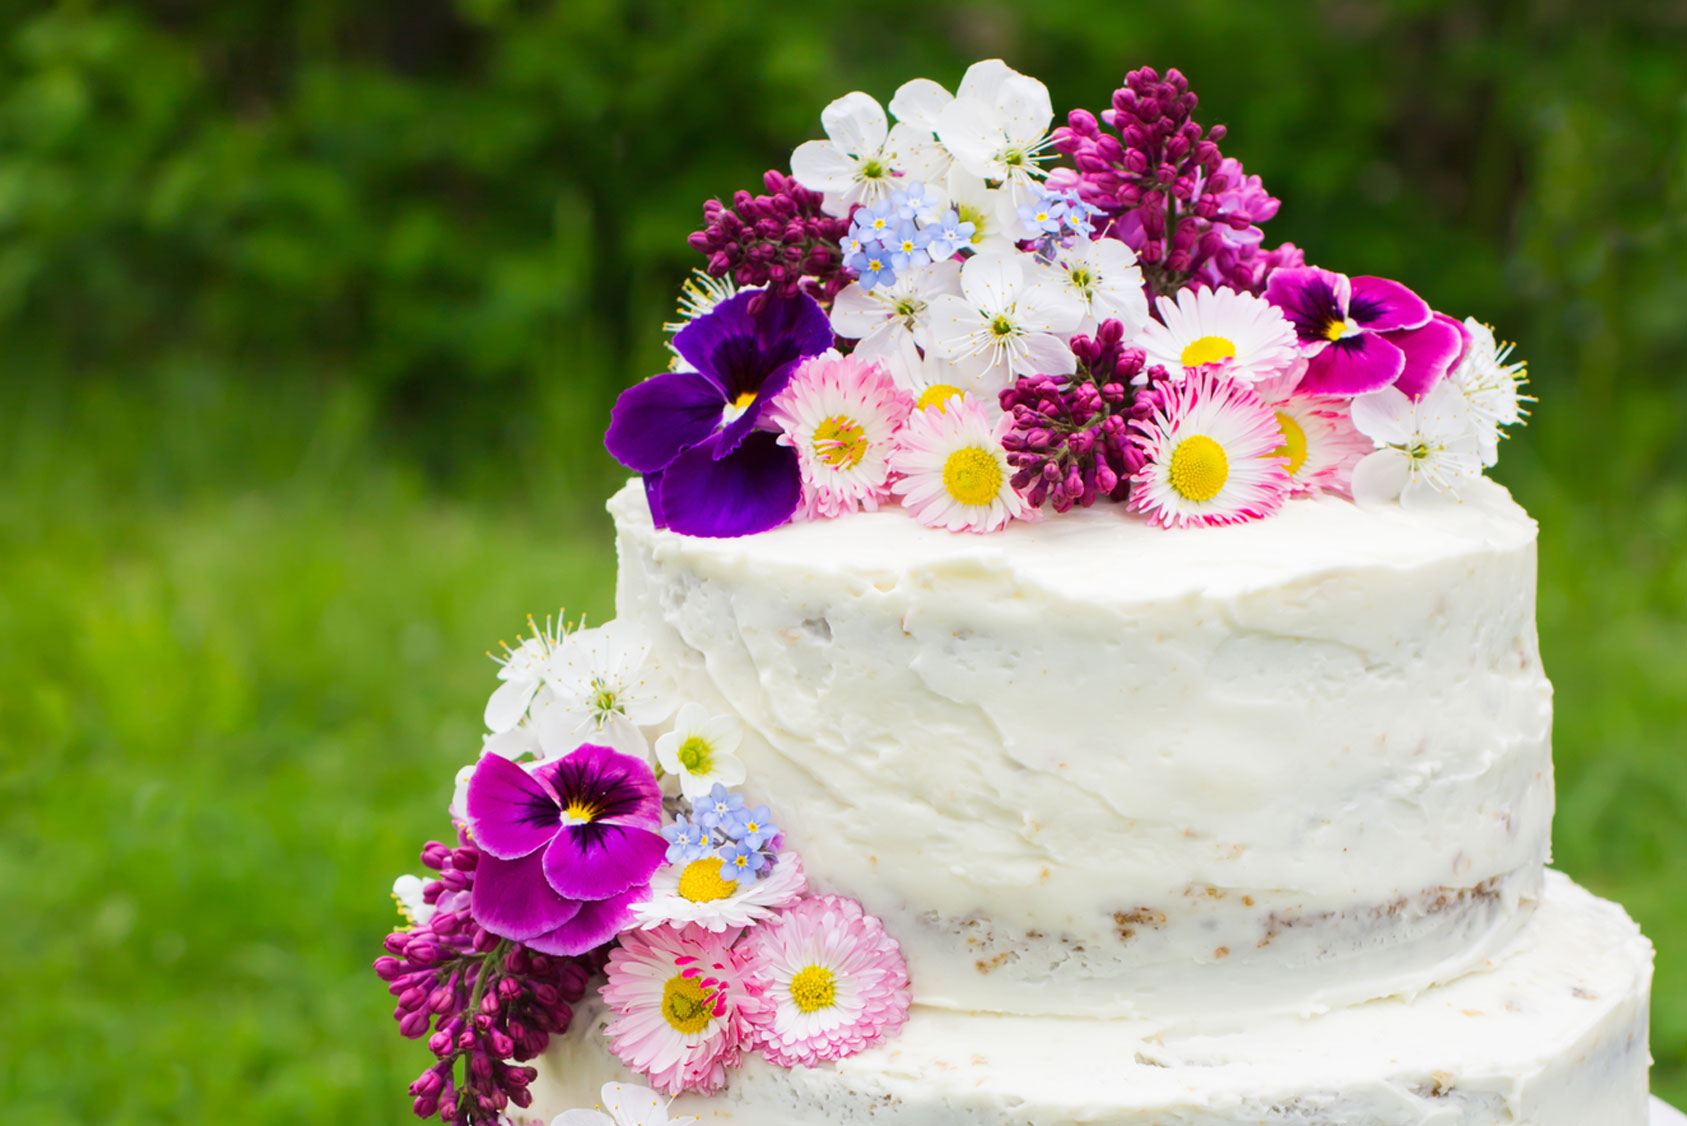 Semi-naked wedding cake with large colourful flowers